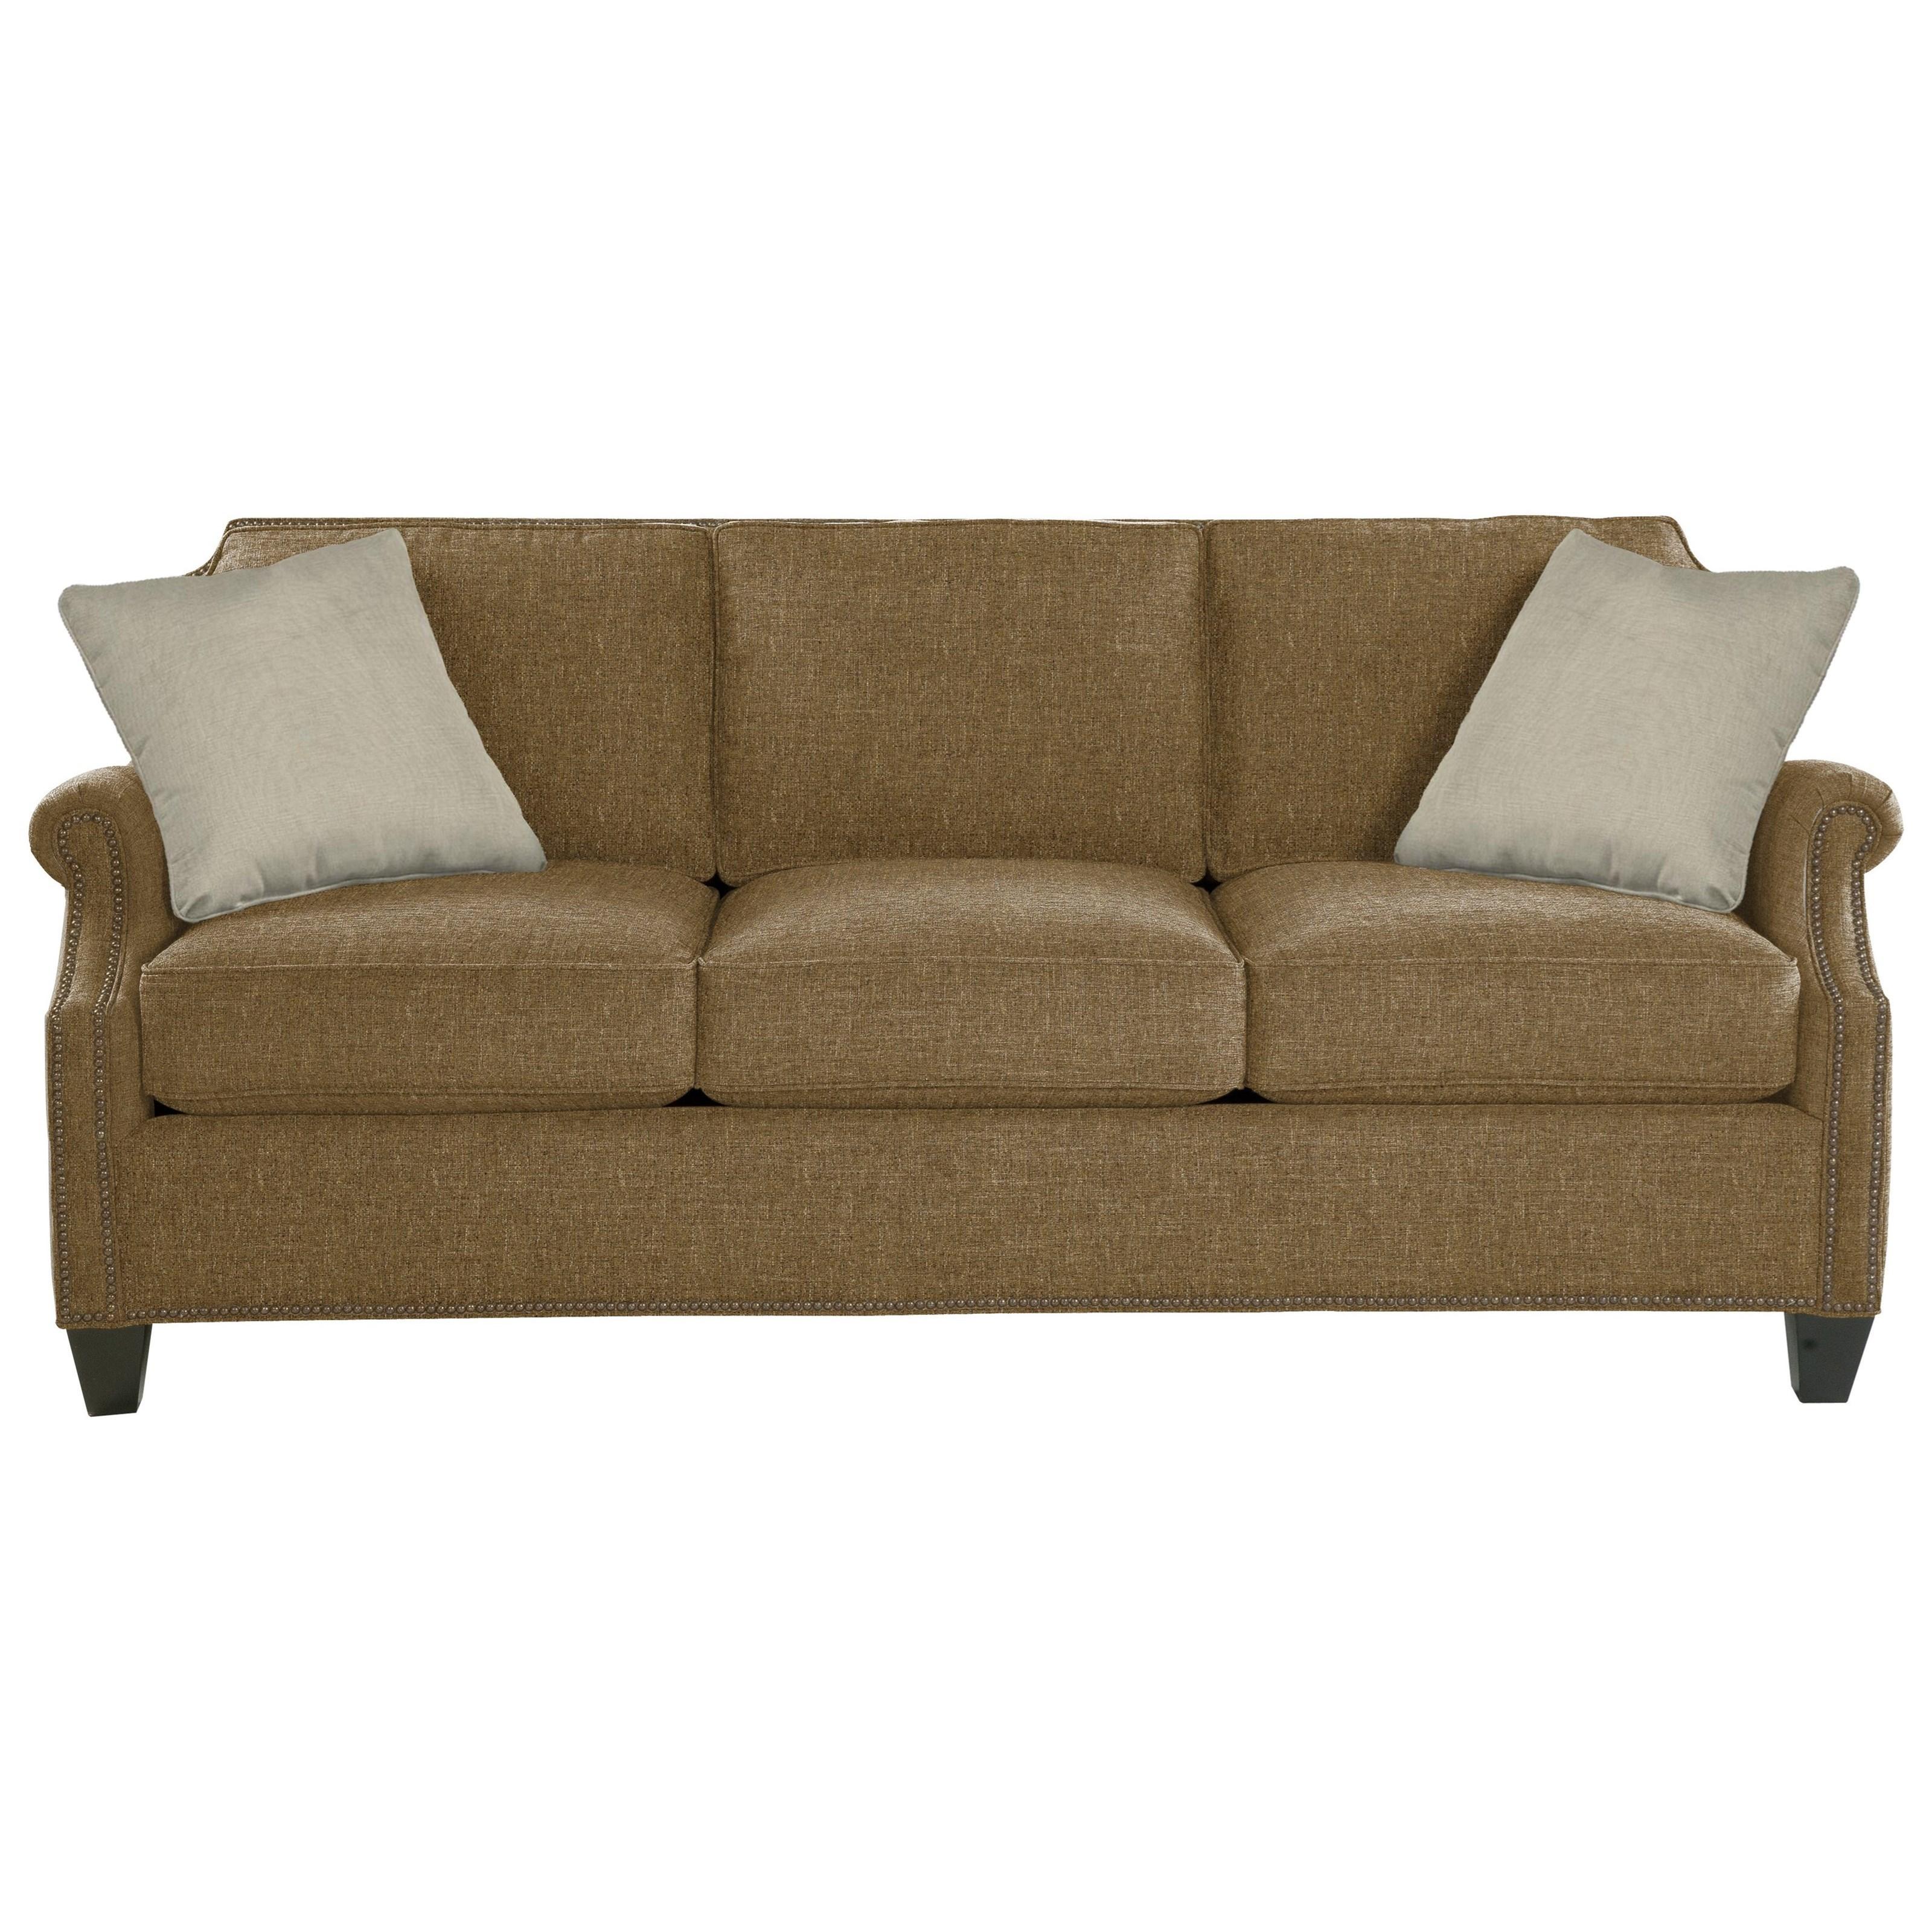 9383 Sofa by Craftmaster at Dean Bosler's